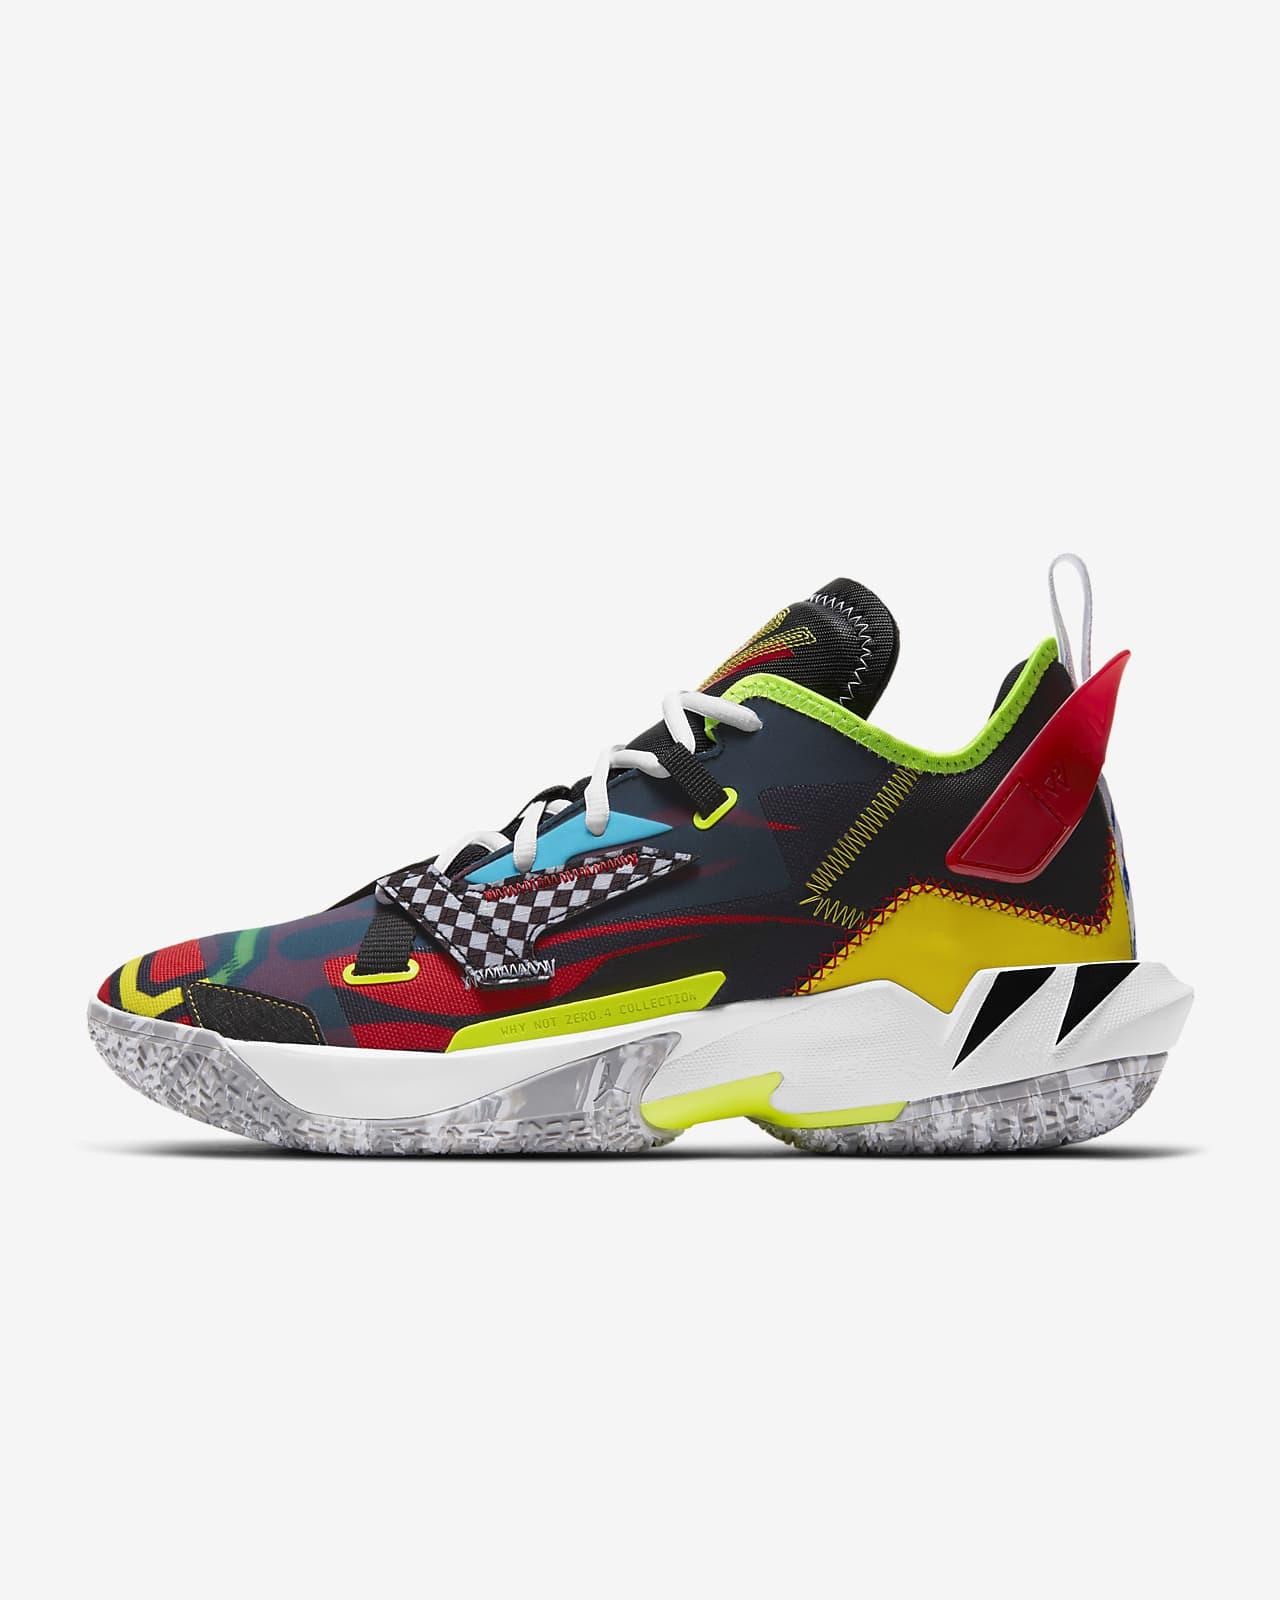 Jordan 'Why Not?' Zer0.4 'Marathon' Basketball Shoe